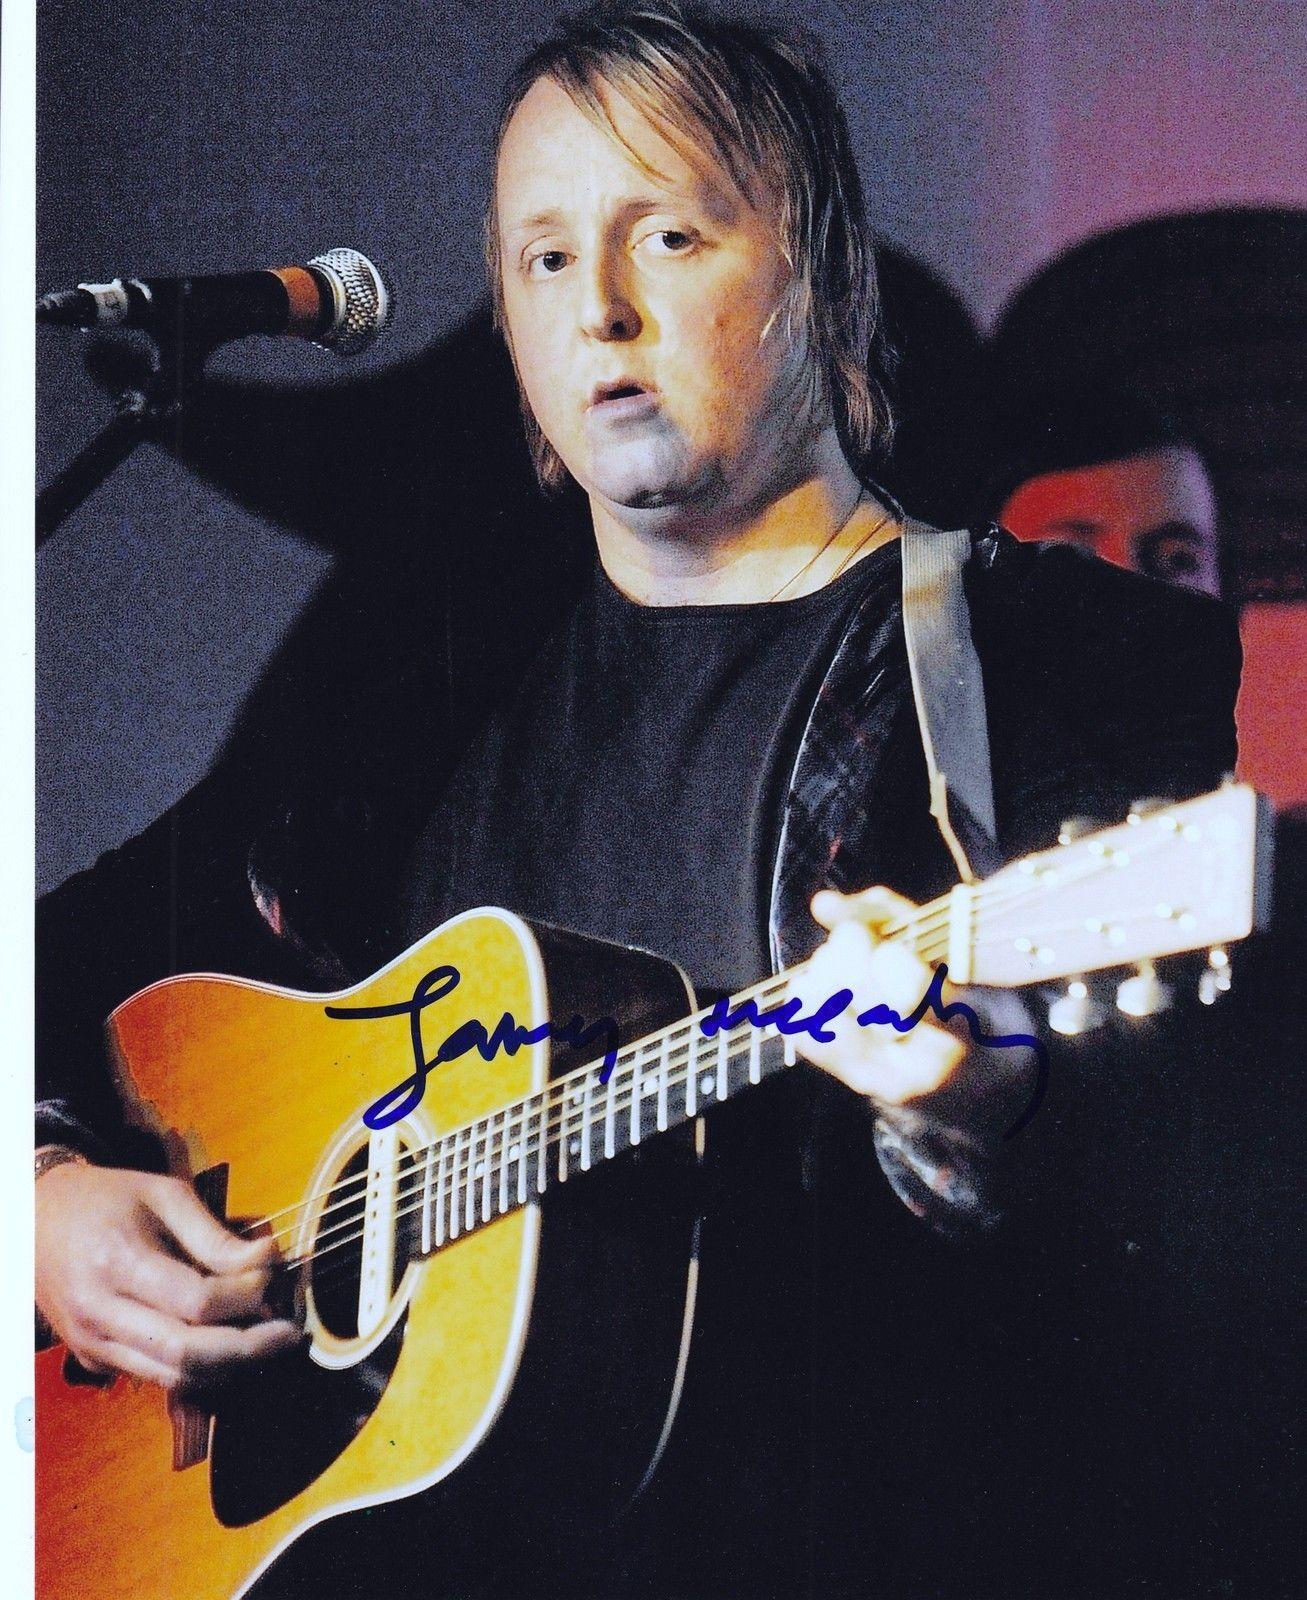 James McCartney Signed 8x10 Photo W/COA Proof Paul The Beatles Angel